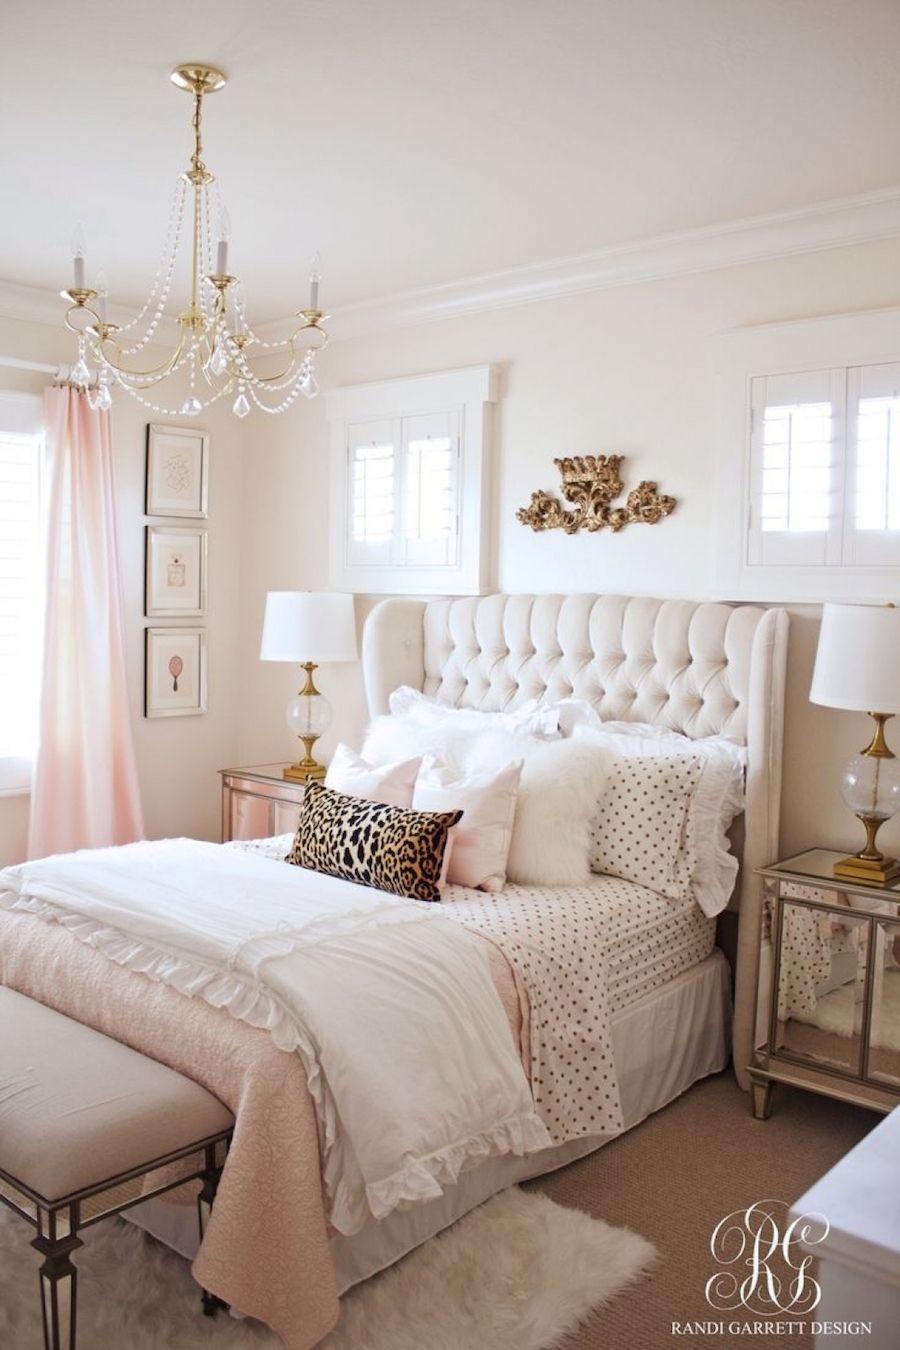 12 Dreamy Decor Ideas For The Bedroom Girls Bedroom Makeover Home Decor Bedroom Gold Bedroom